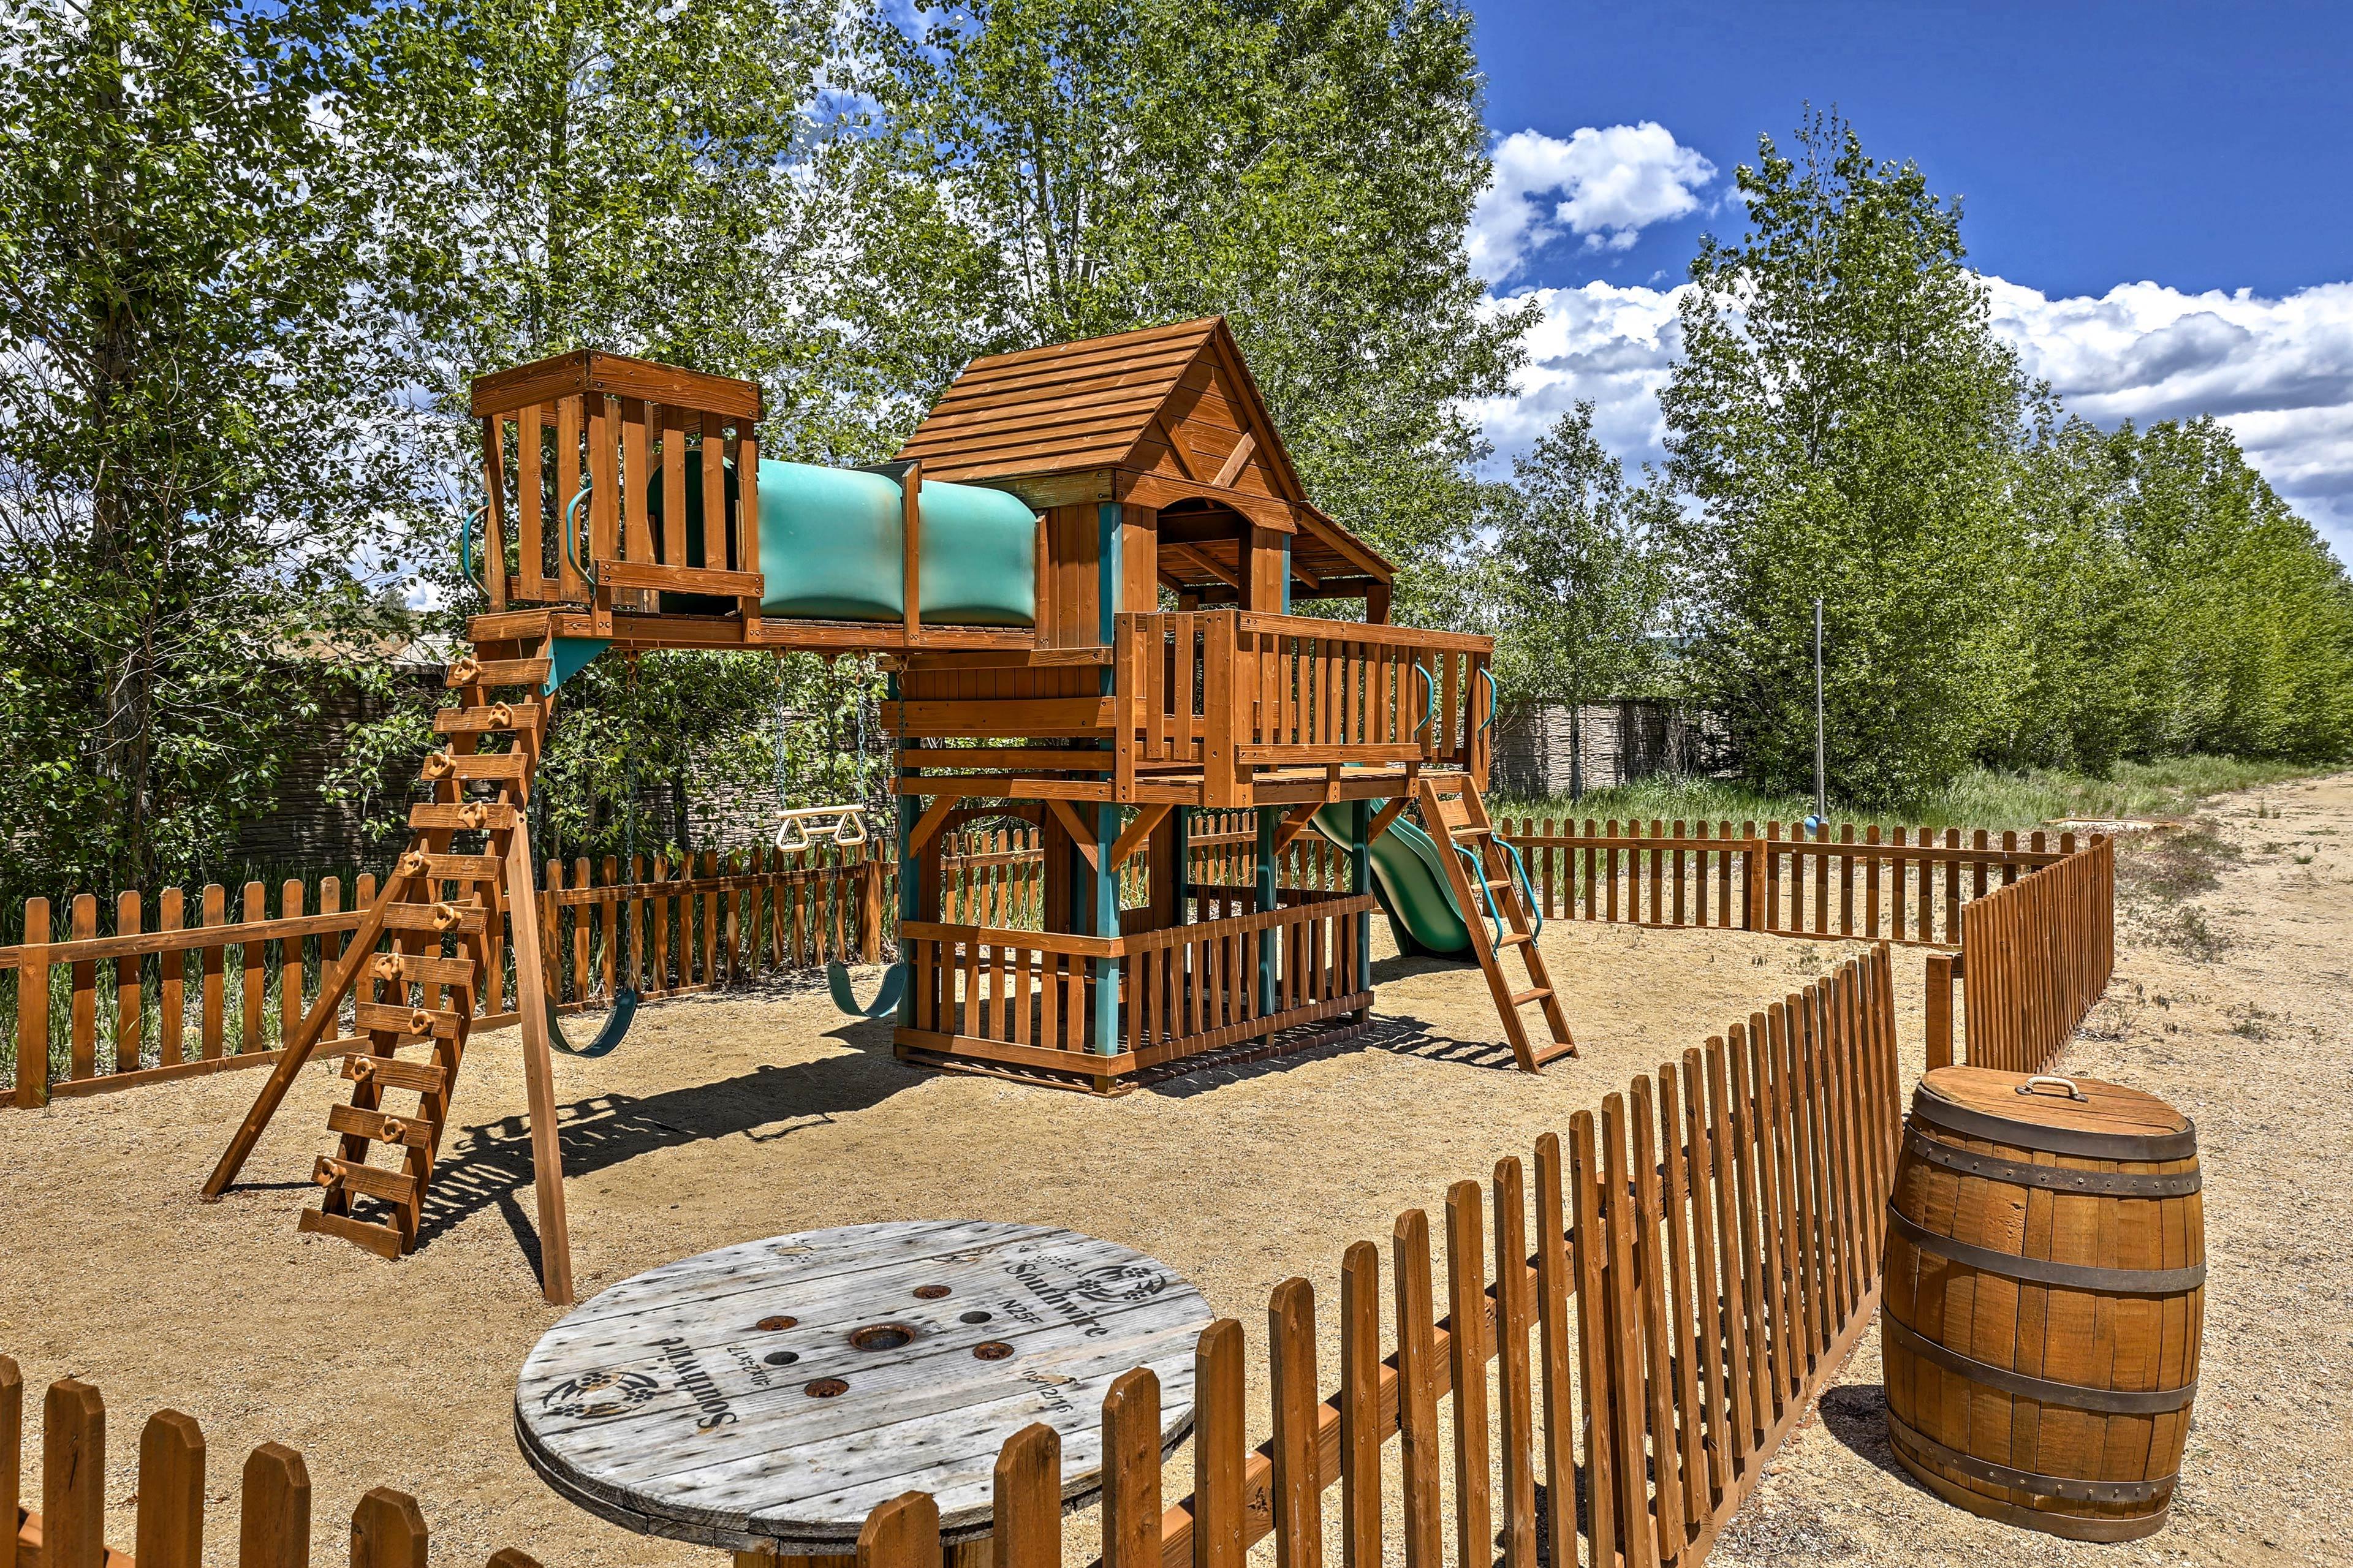 Let the kiddos romp around the playground!